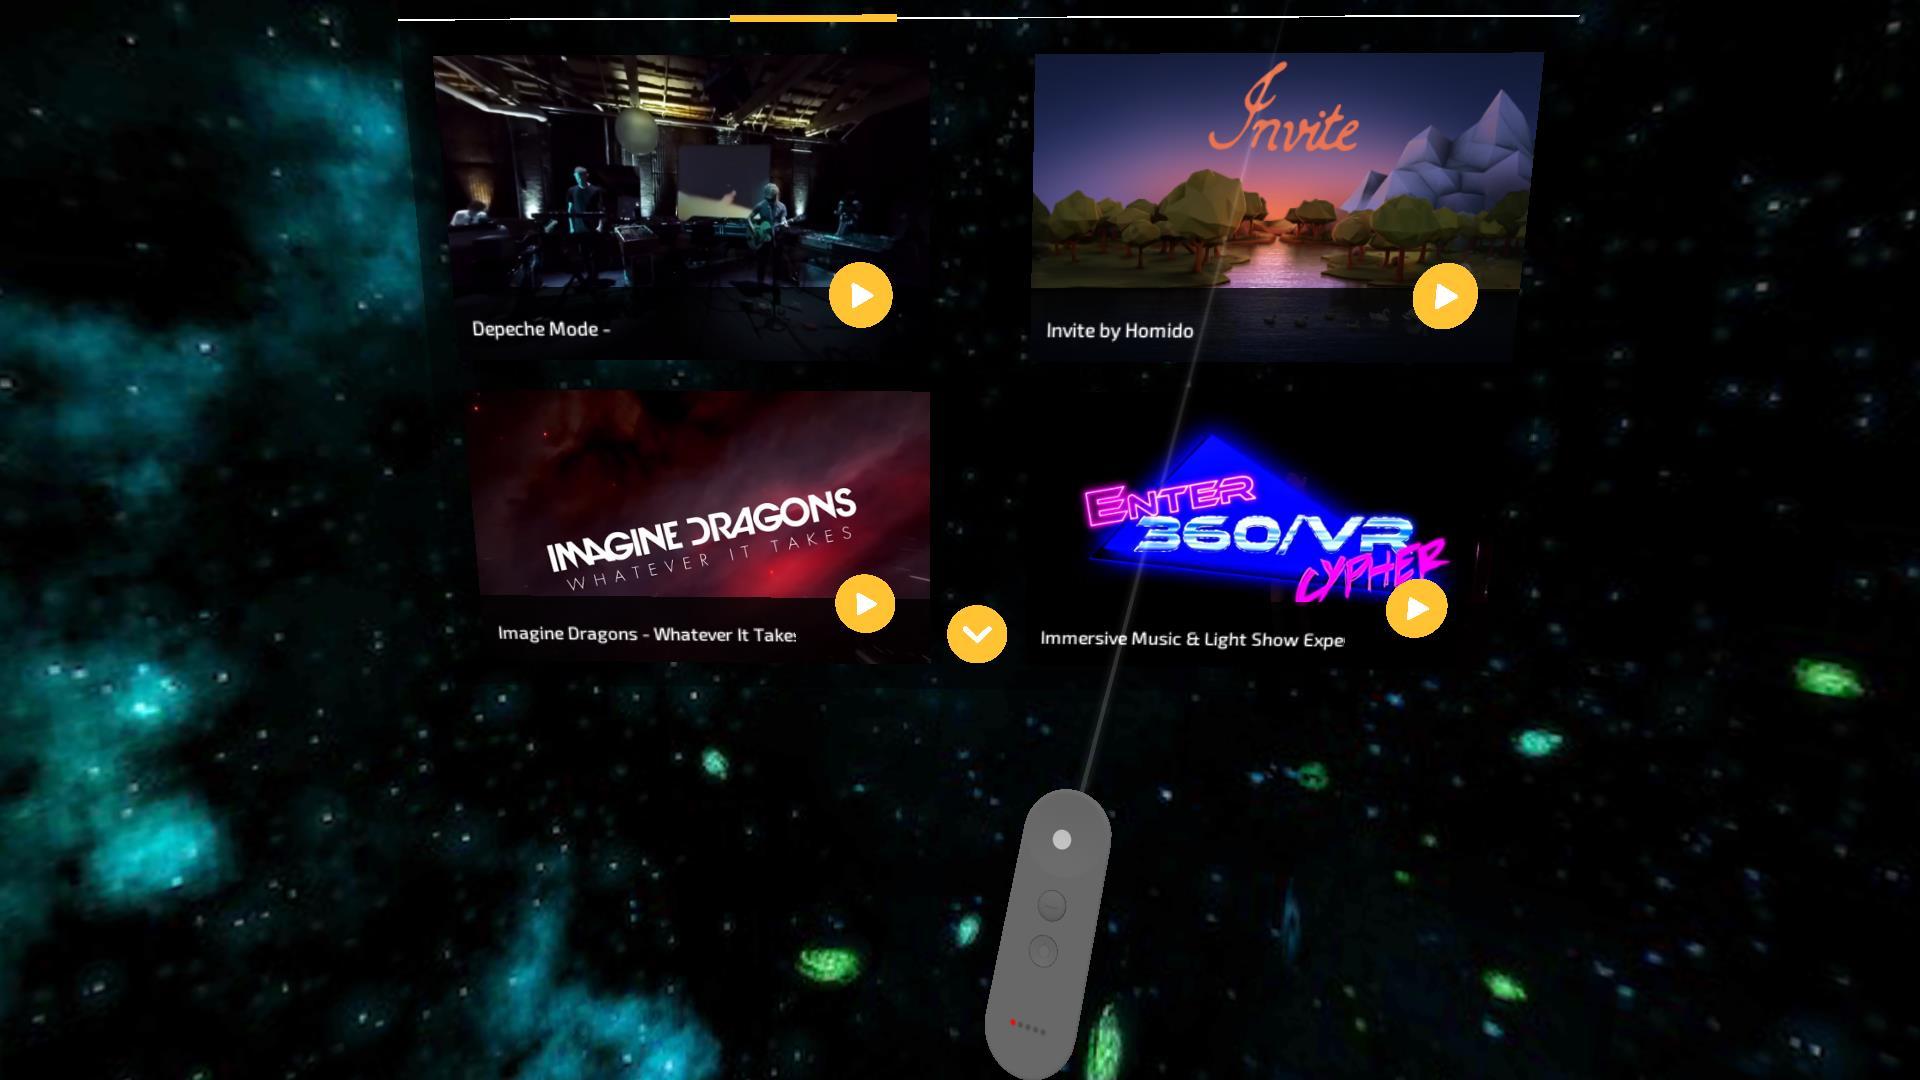 VR Stream by Homido Flip edition